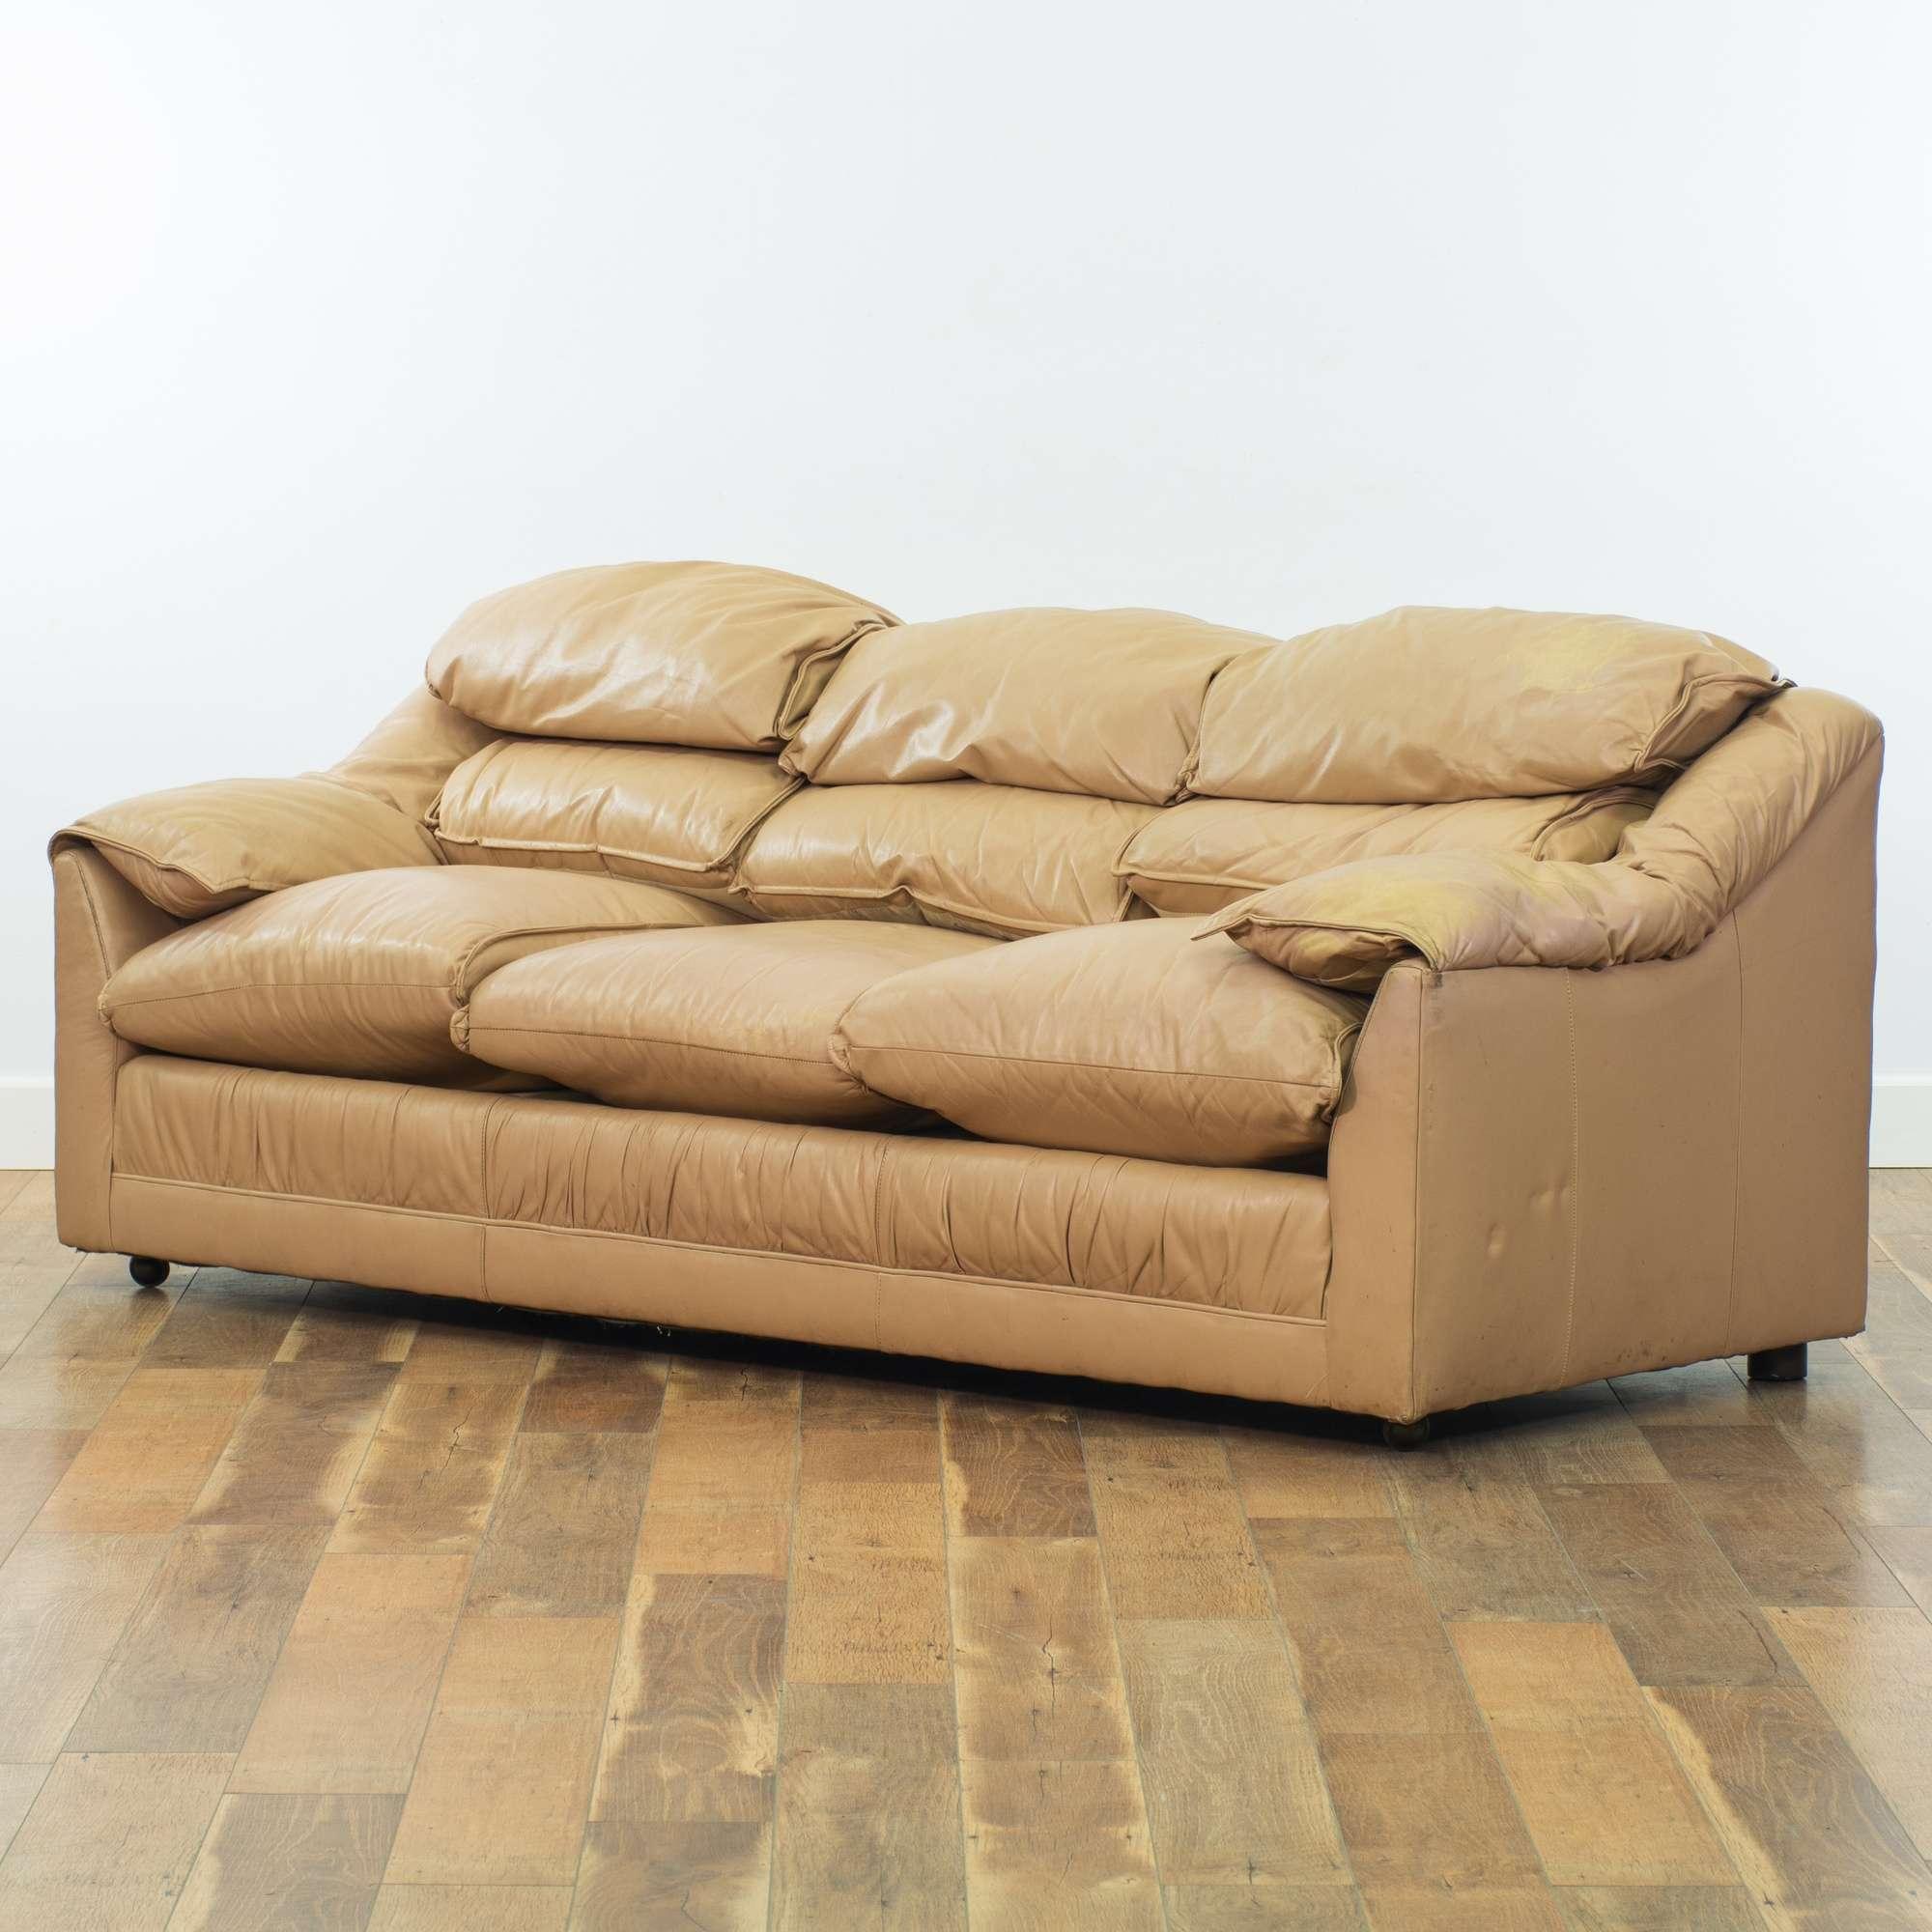 Emerson Tan Overstuffed Leather Sofa